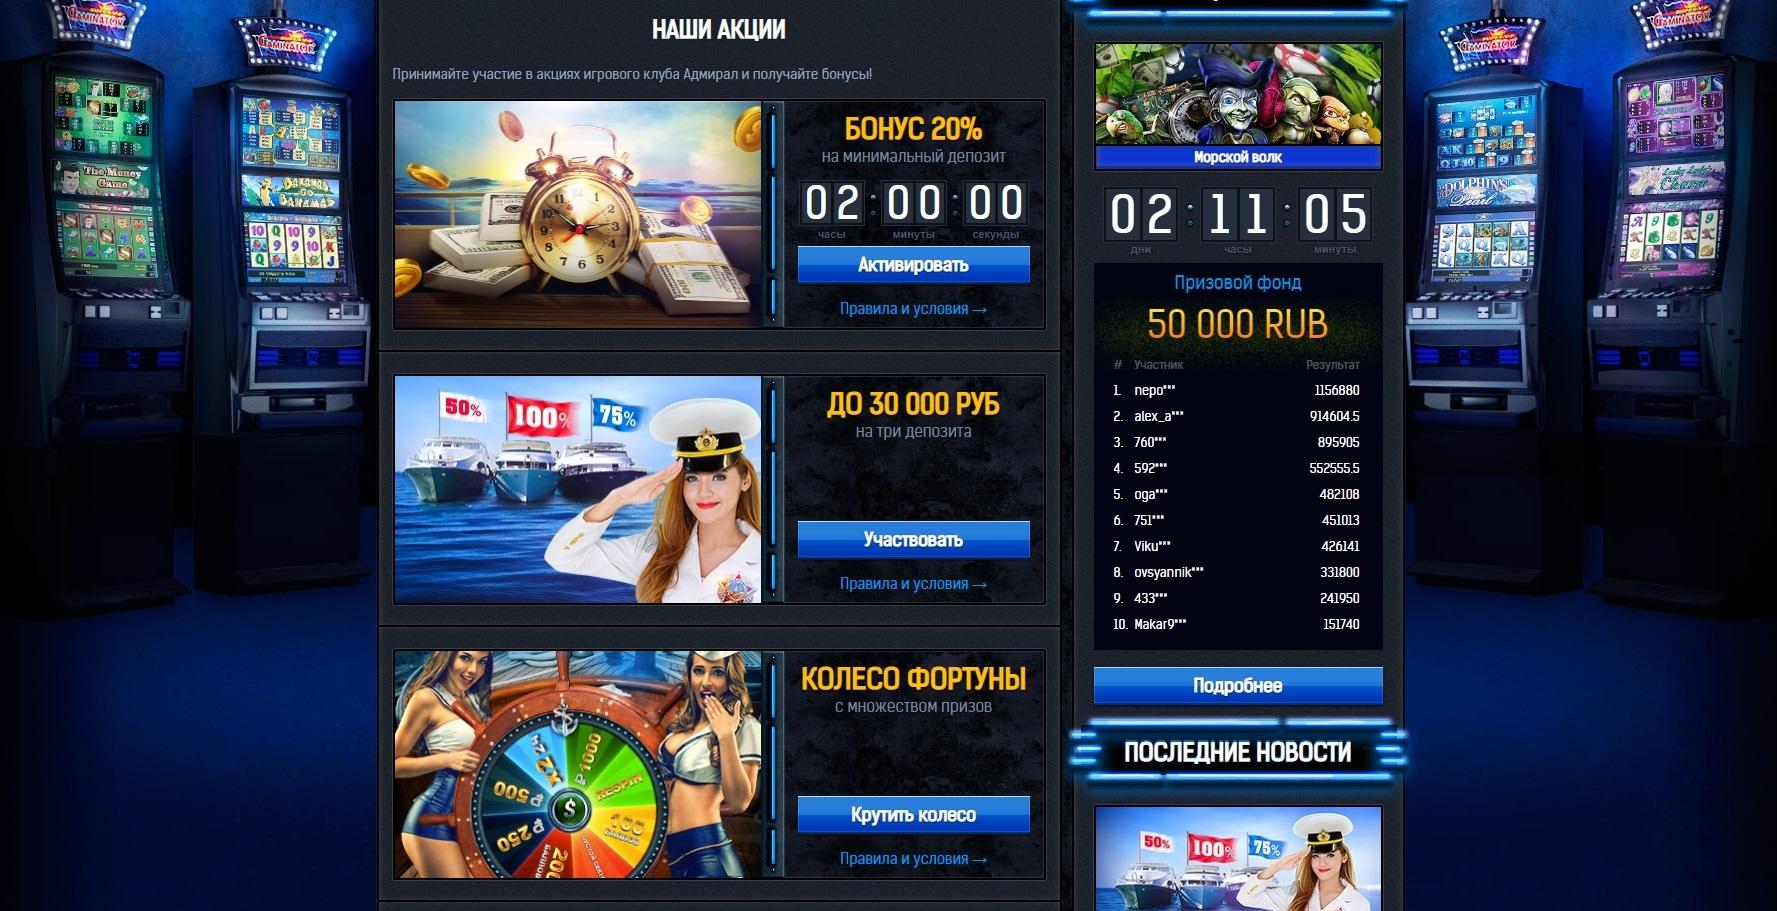 официальный сайт онлайн казино адмирал без депозита